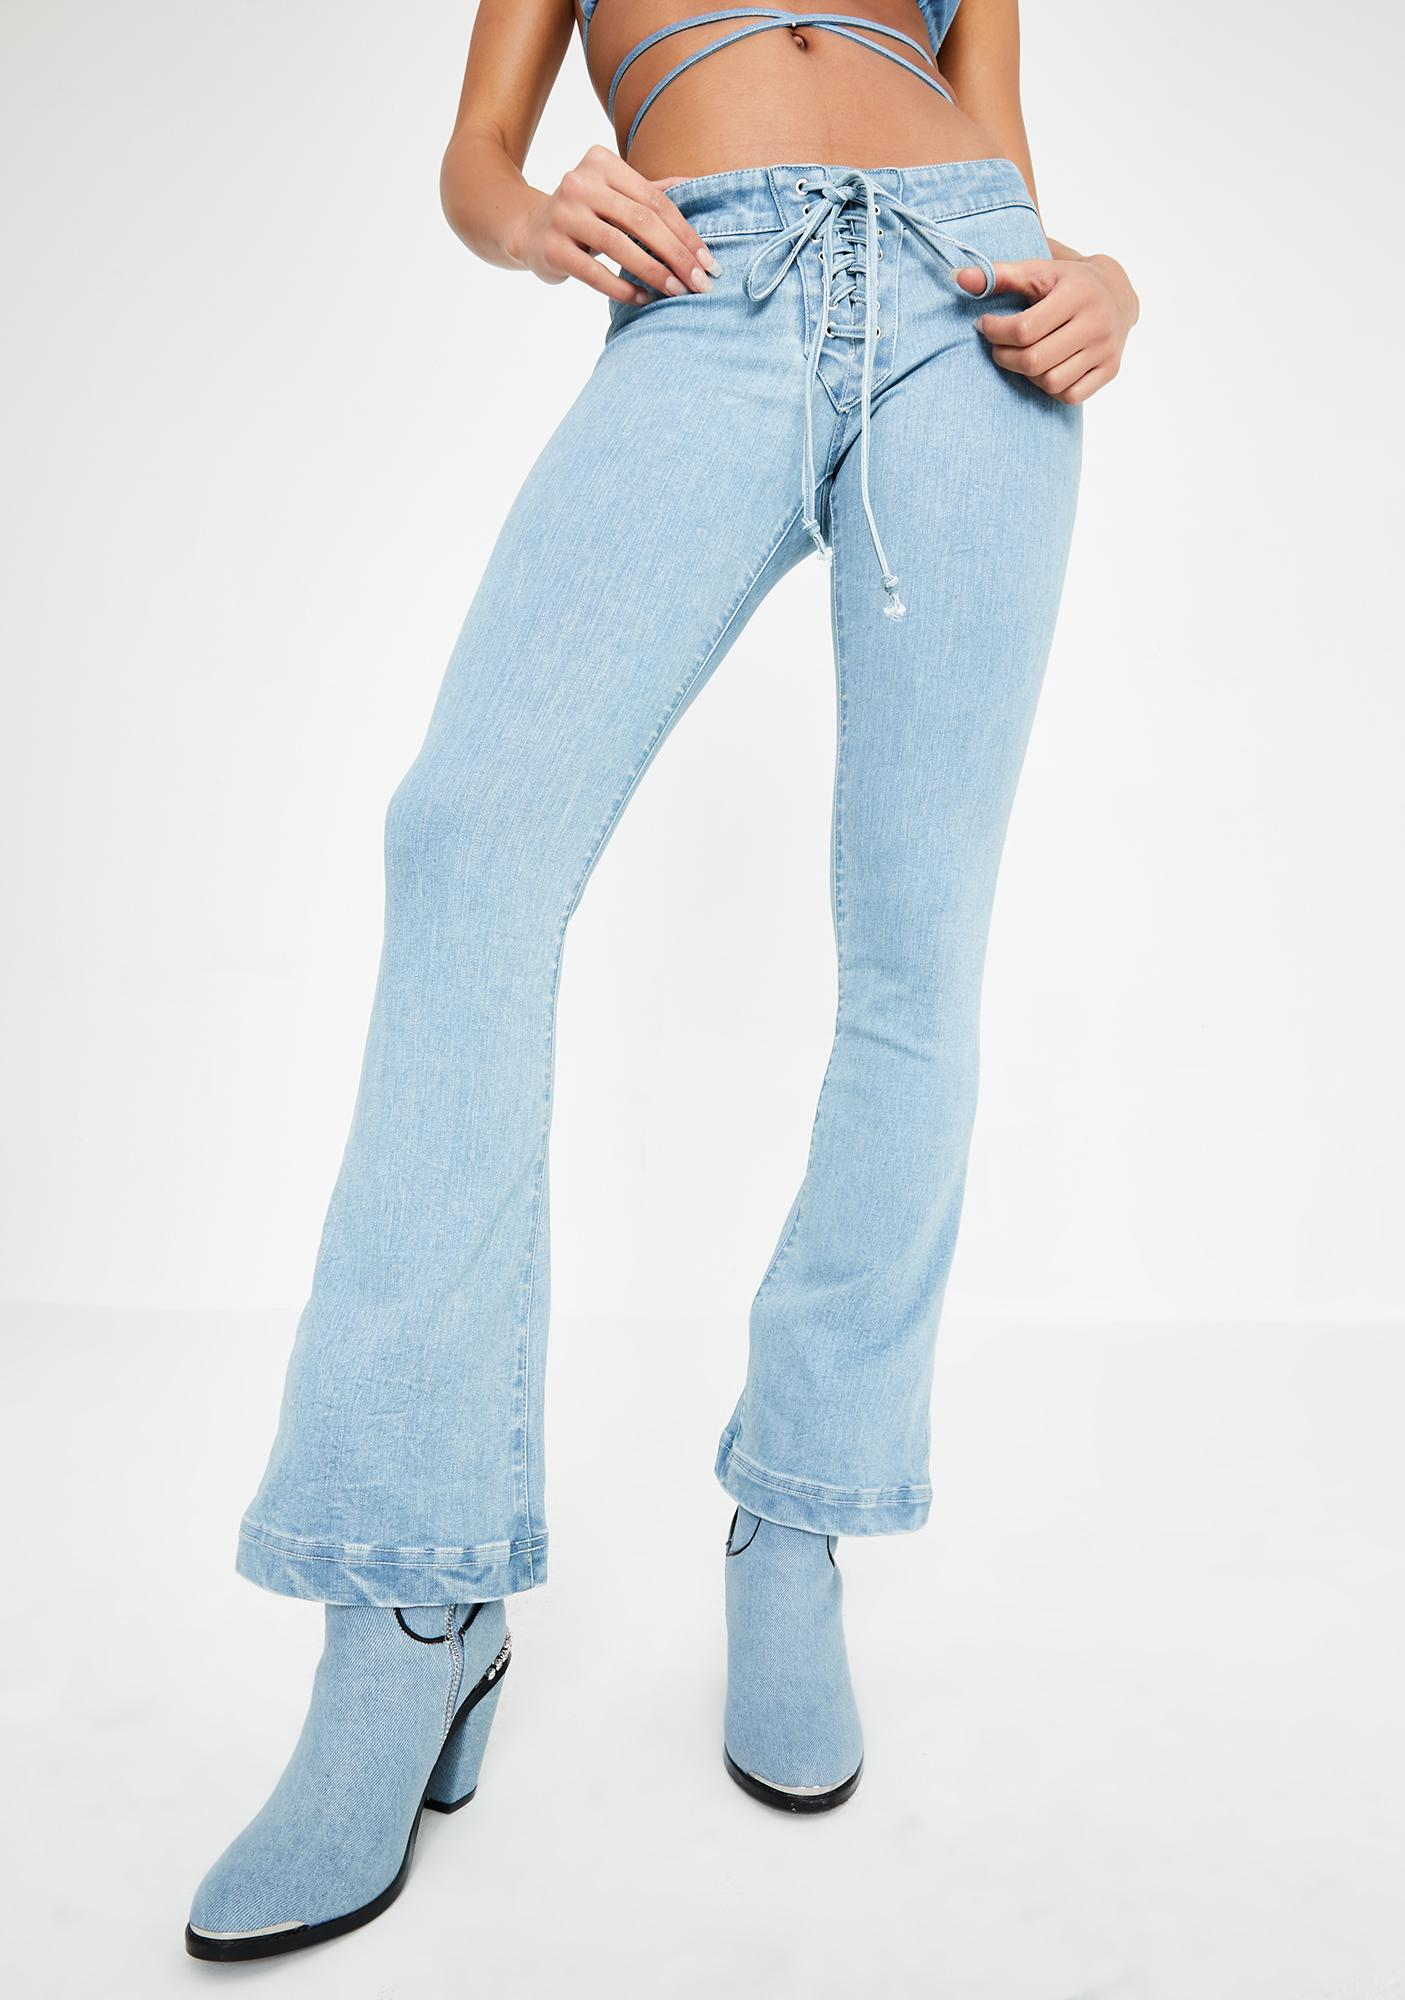 Club Exx American Outlawz Denim Jeans